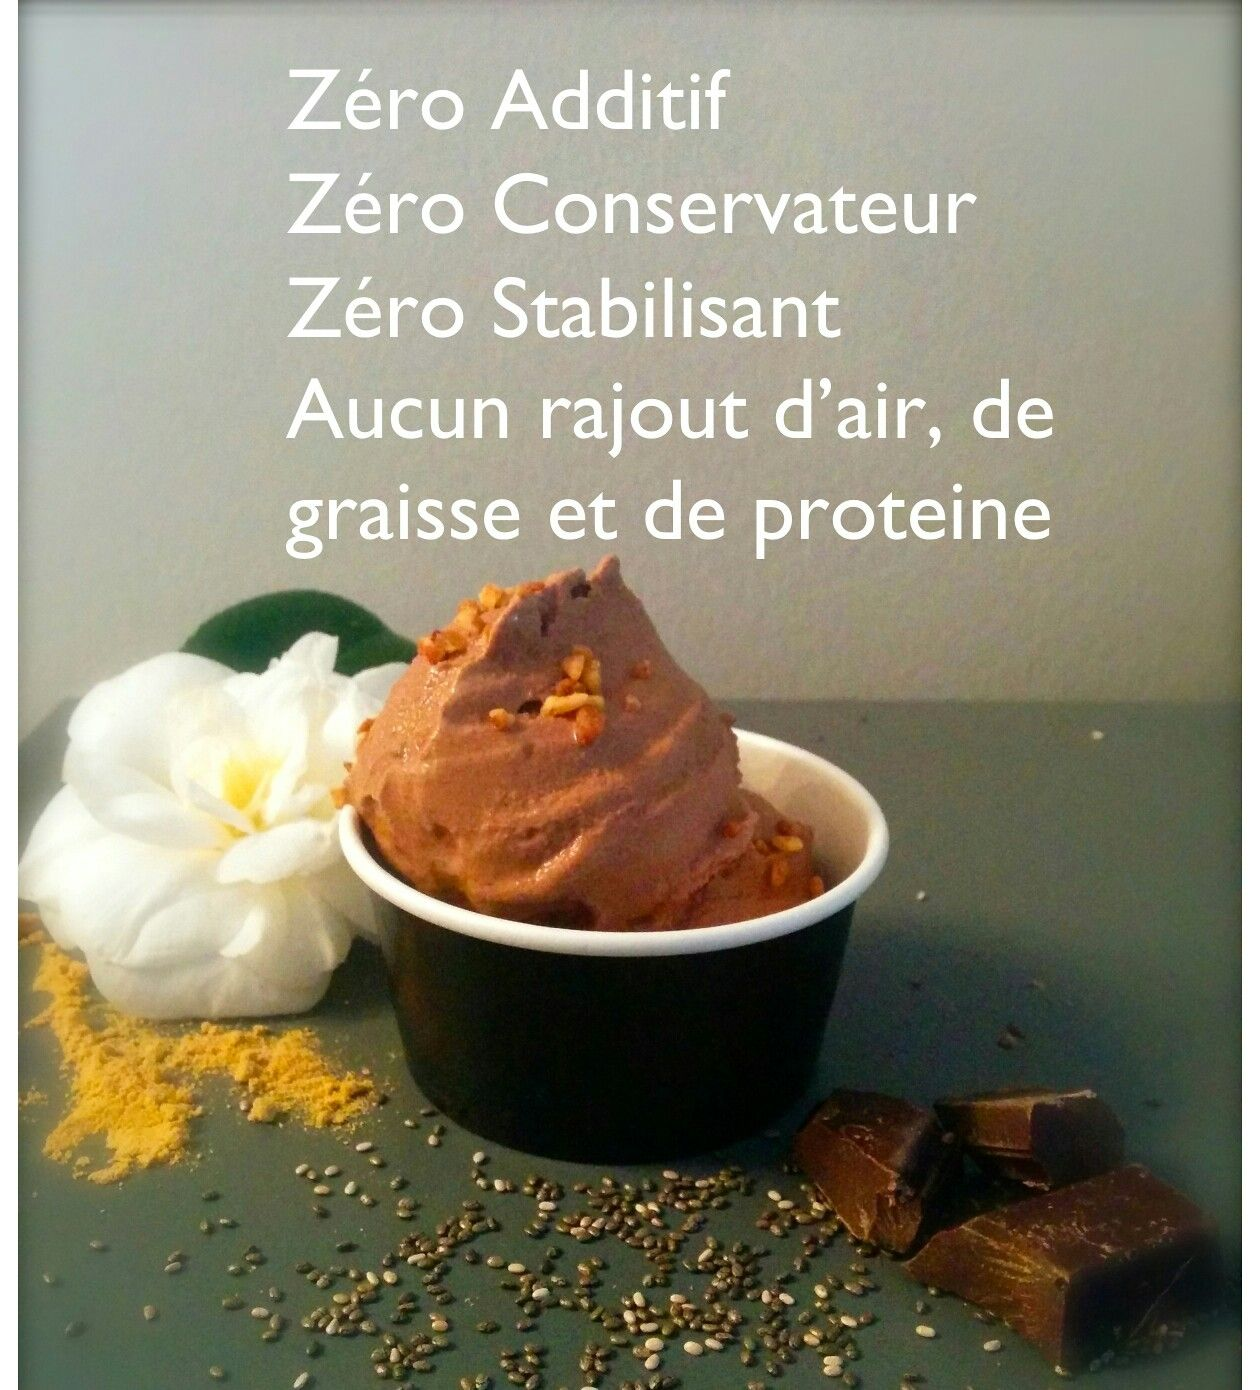 glace azote liquide moleculaire  liquid nitrogen ice cream molecular